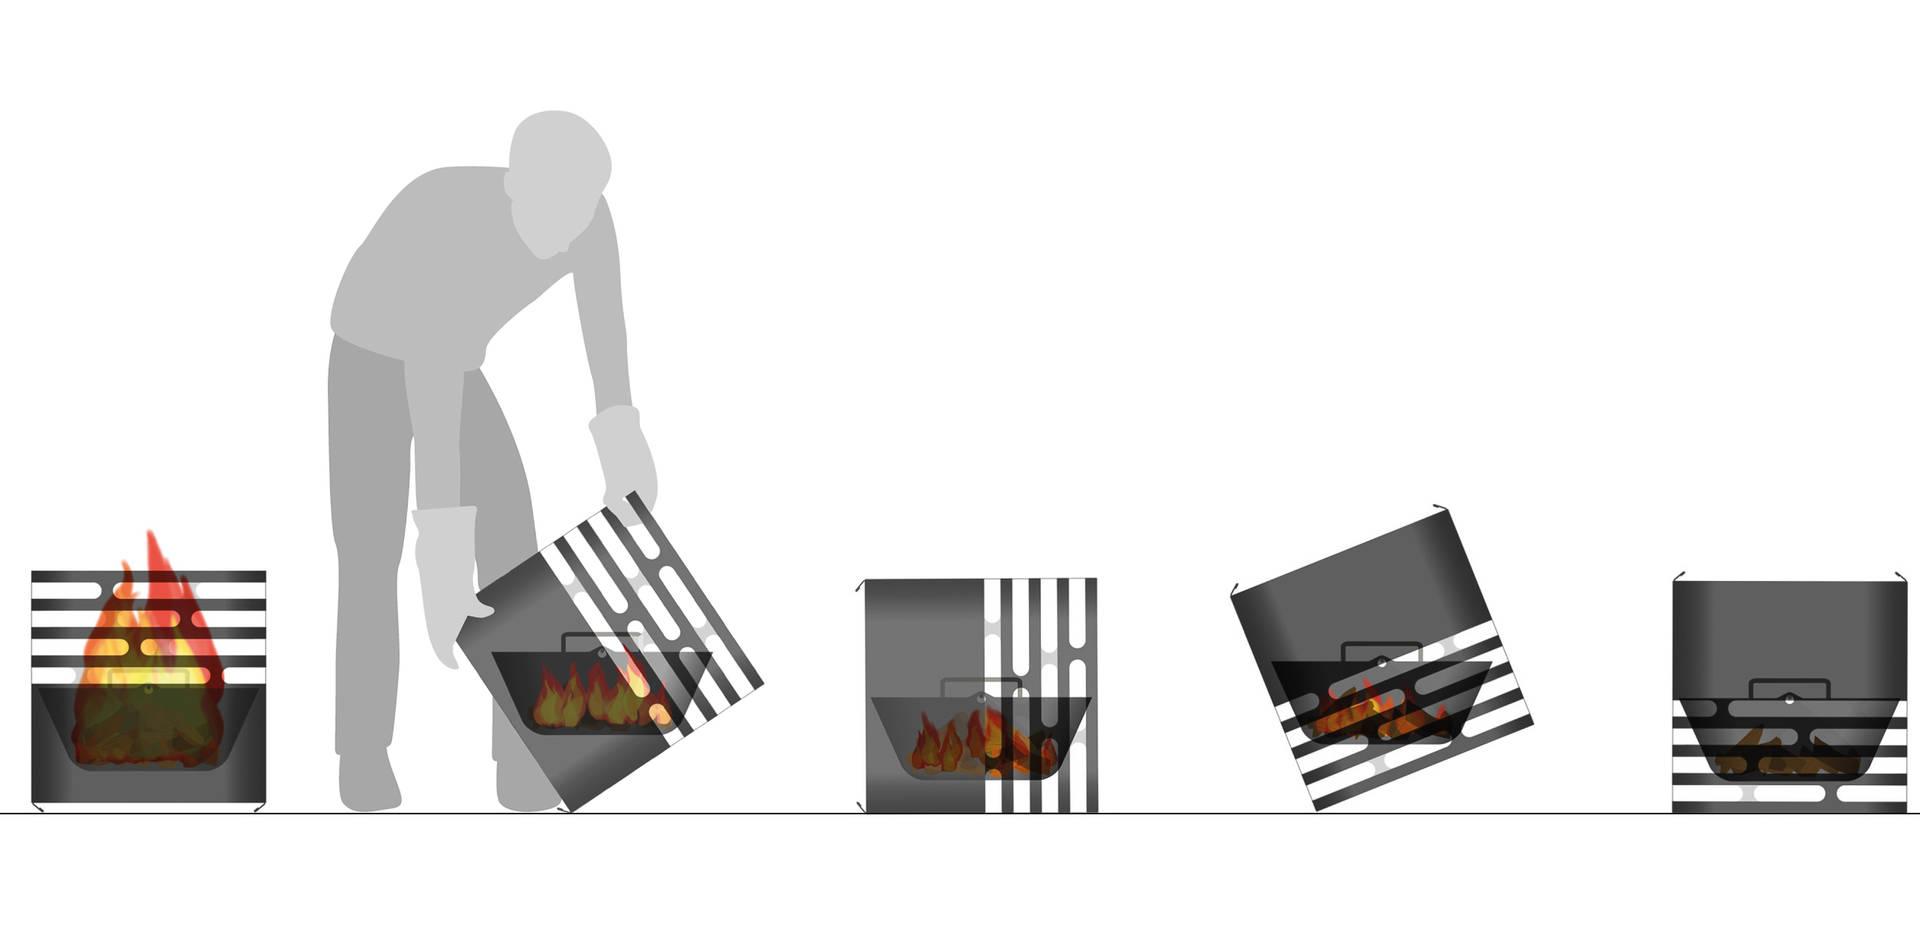 gril höfats cube